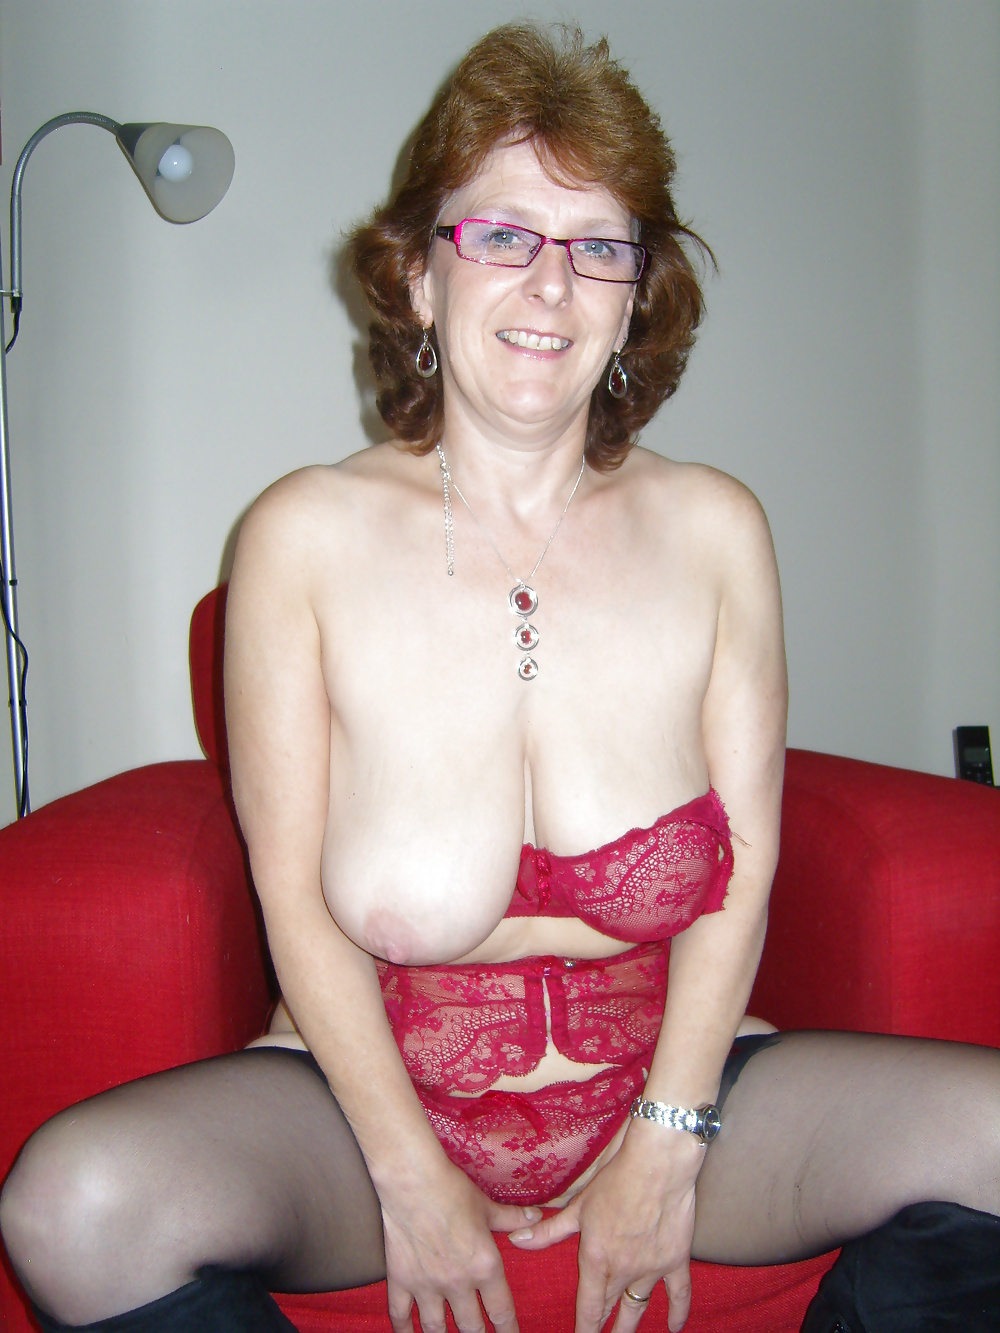 Hot milf granny